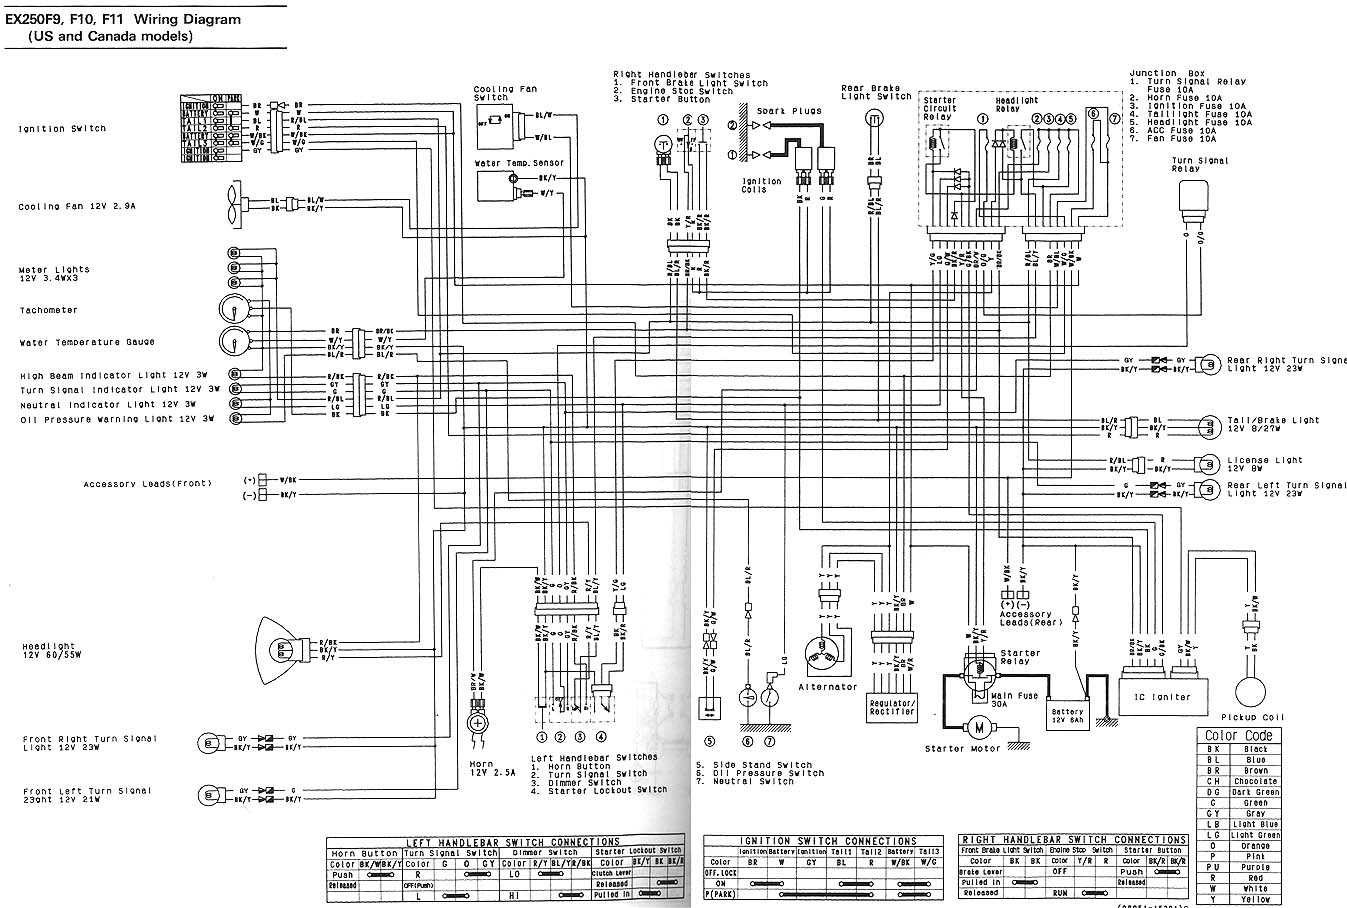 Kawasaki Ninja 250r Wiring Harness Diagram - custom project ... on